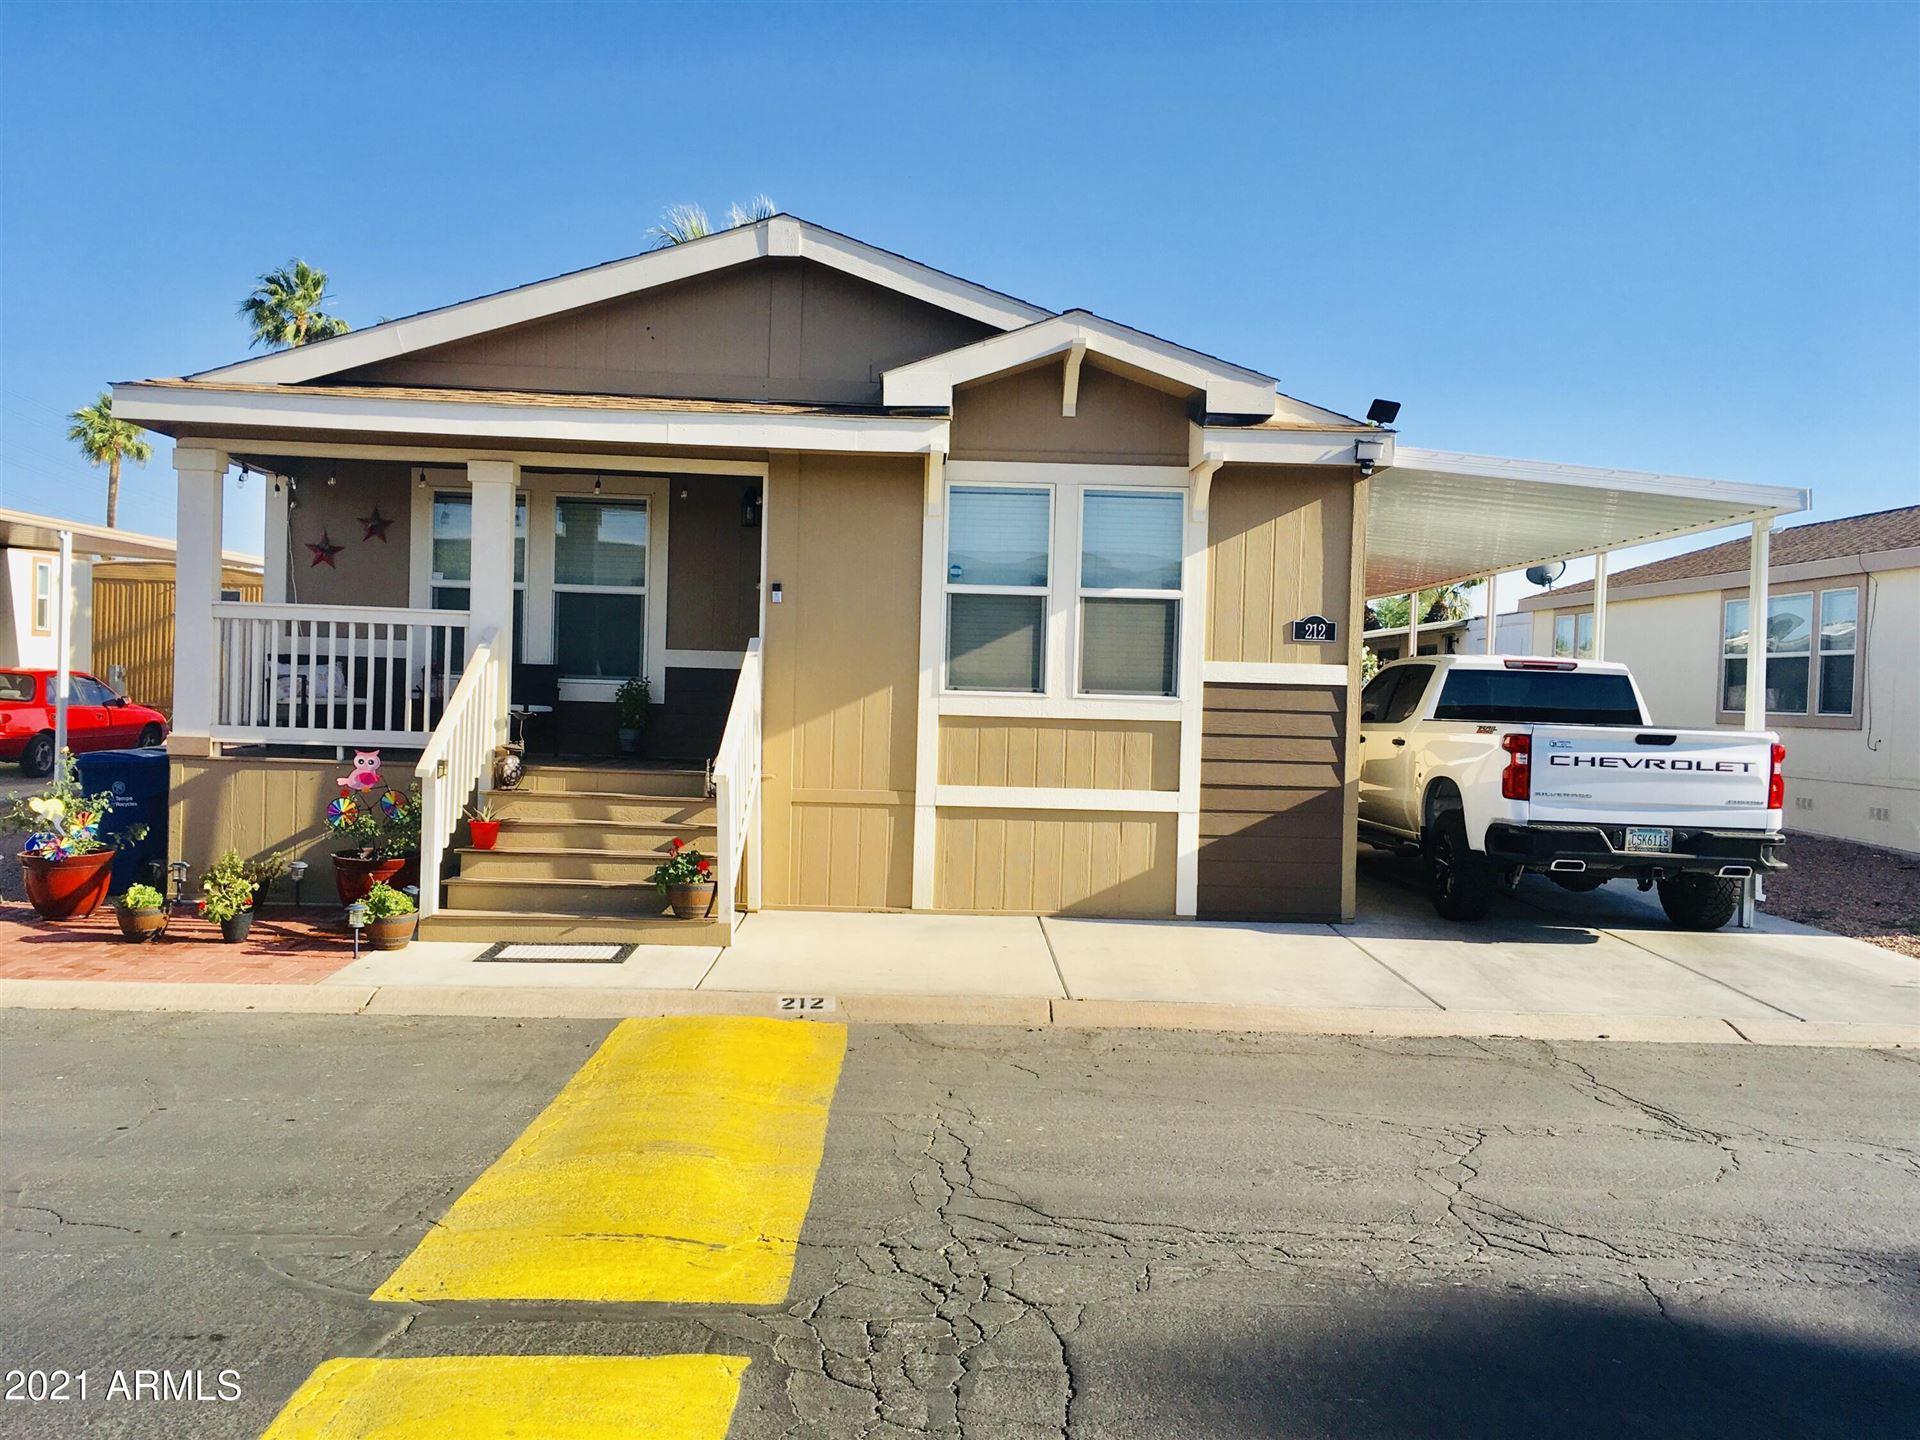 400 W Baseline #212 Road, Tempe, AZ 85283 - MLS#: 6242533